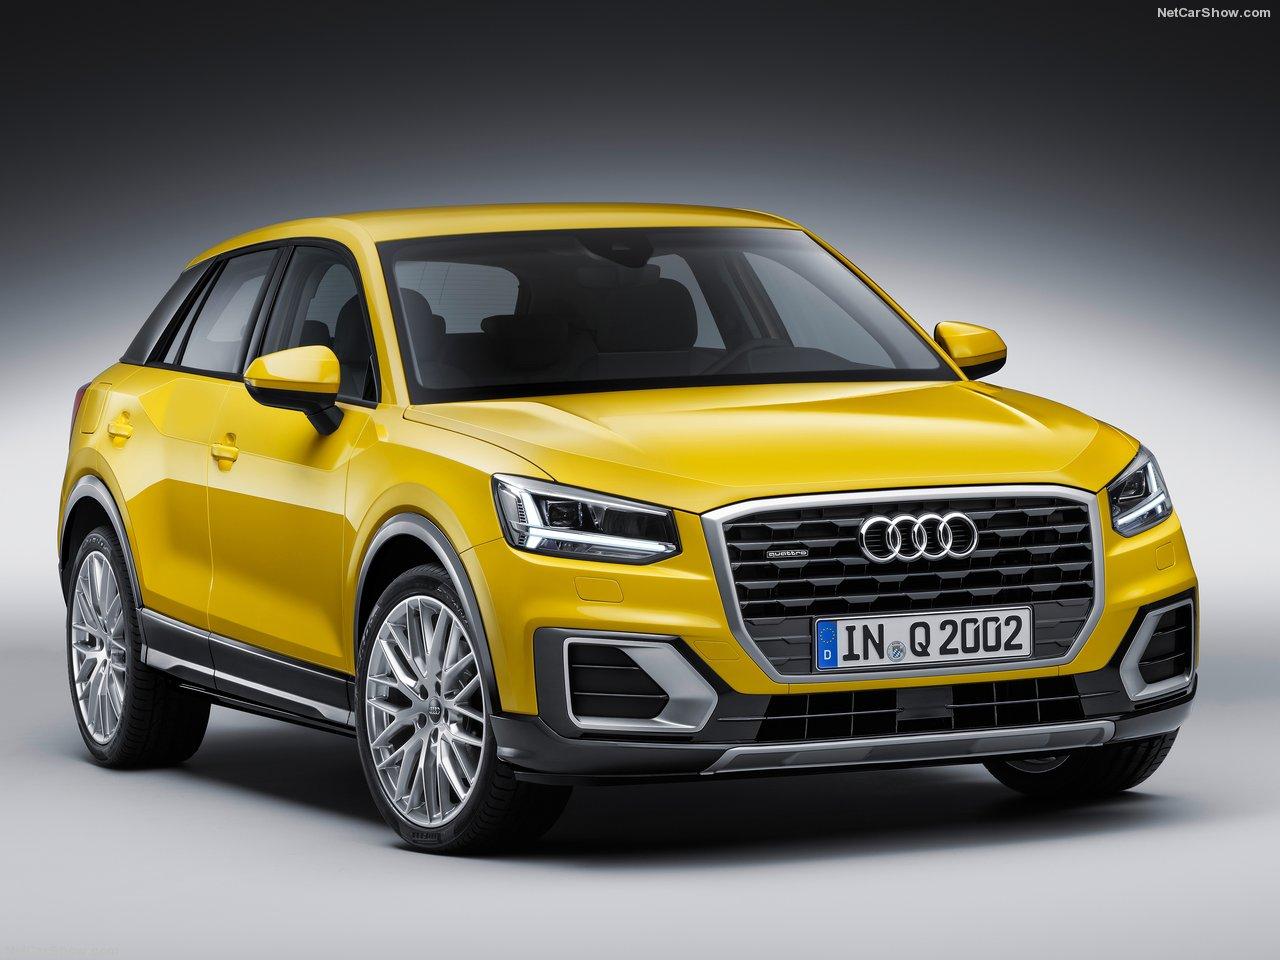 Audi-Q2-2017-1280-38.jpg